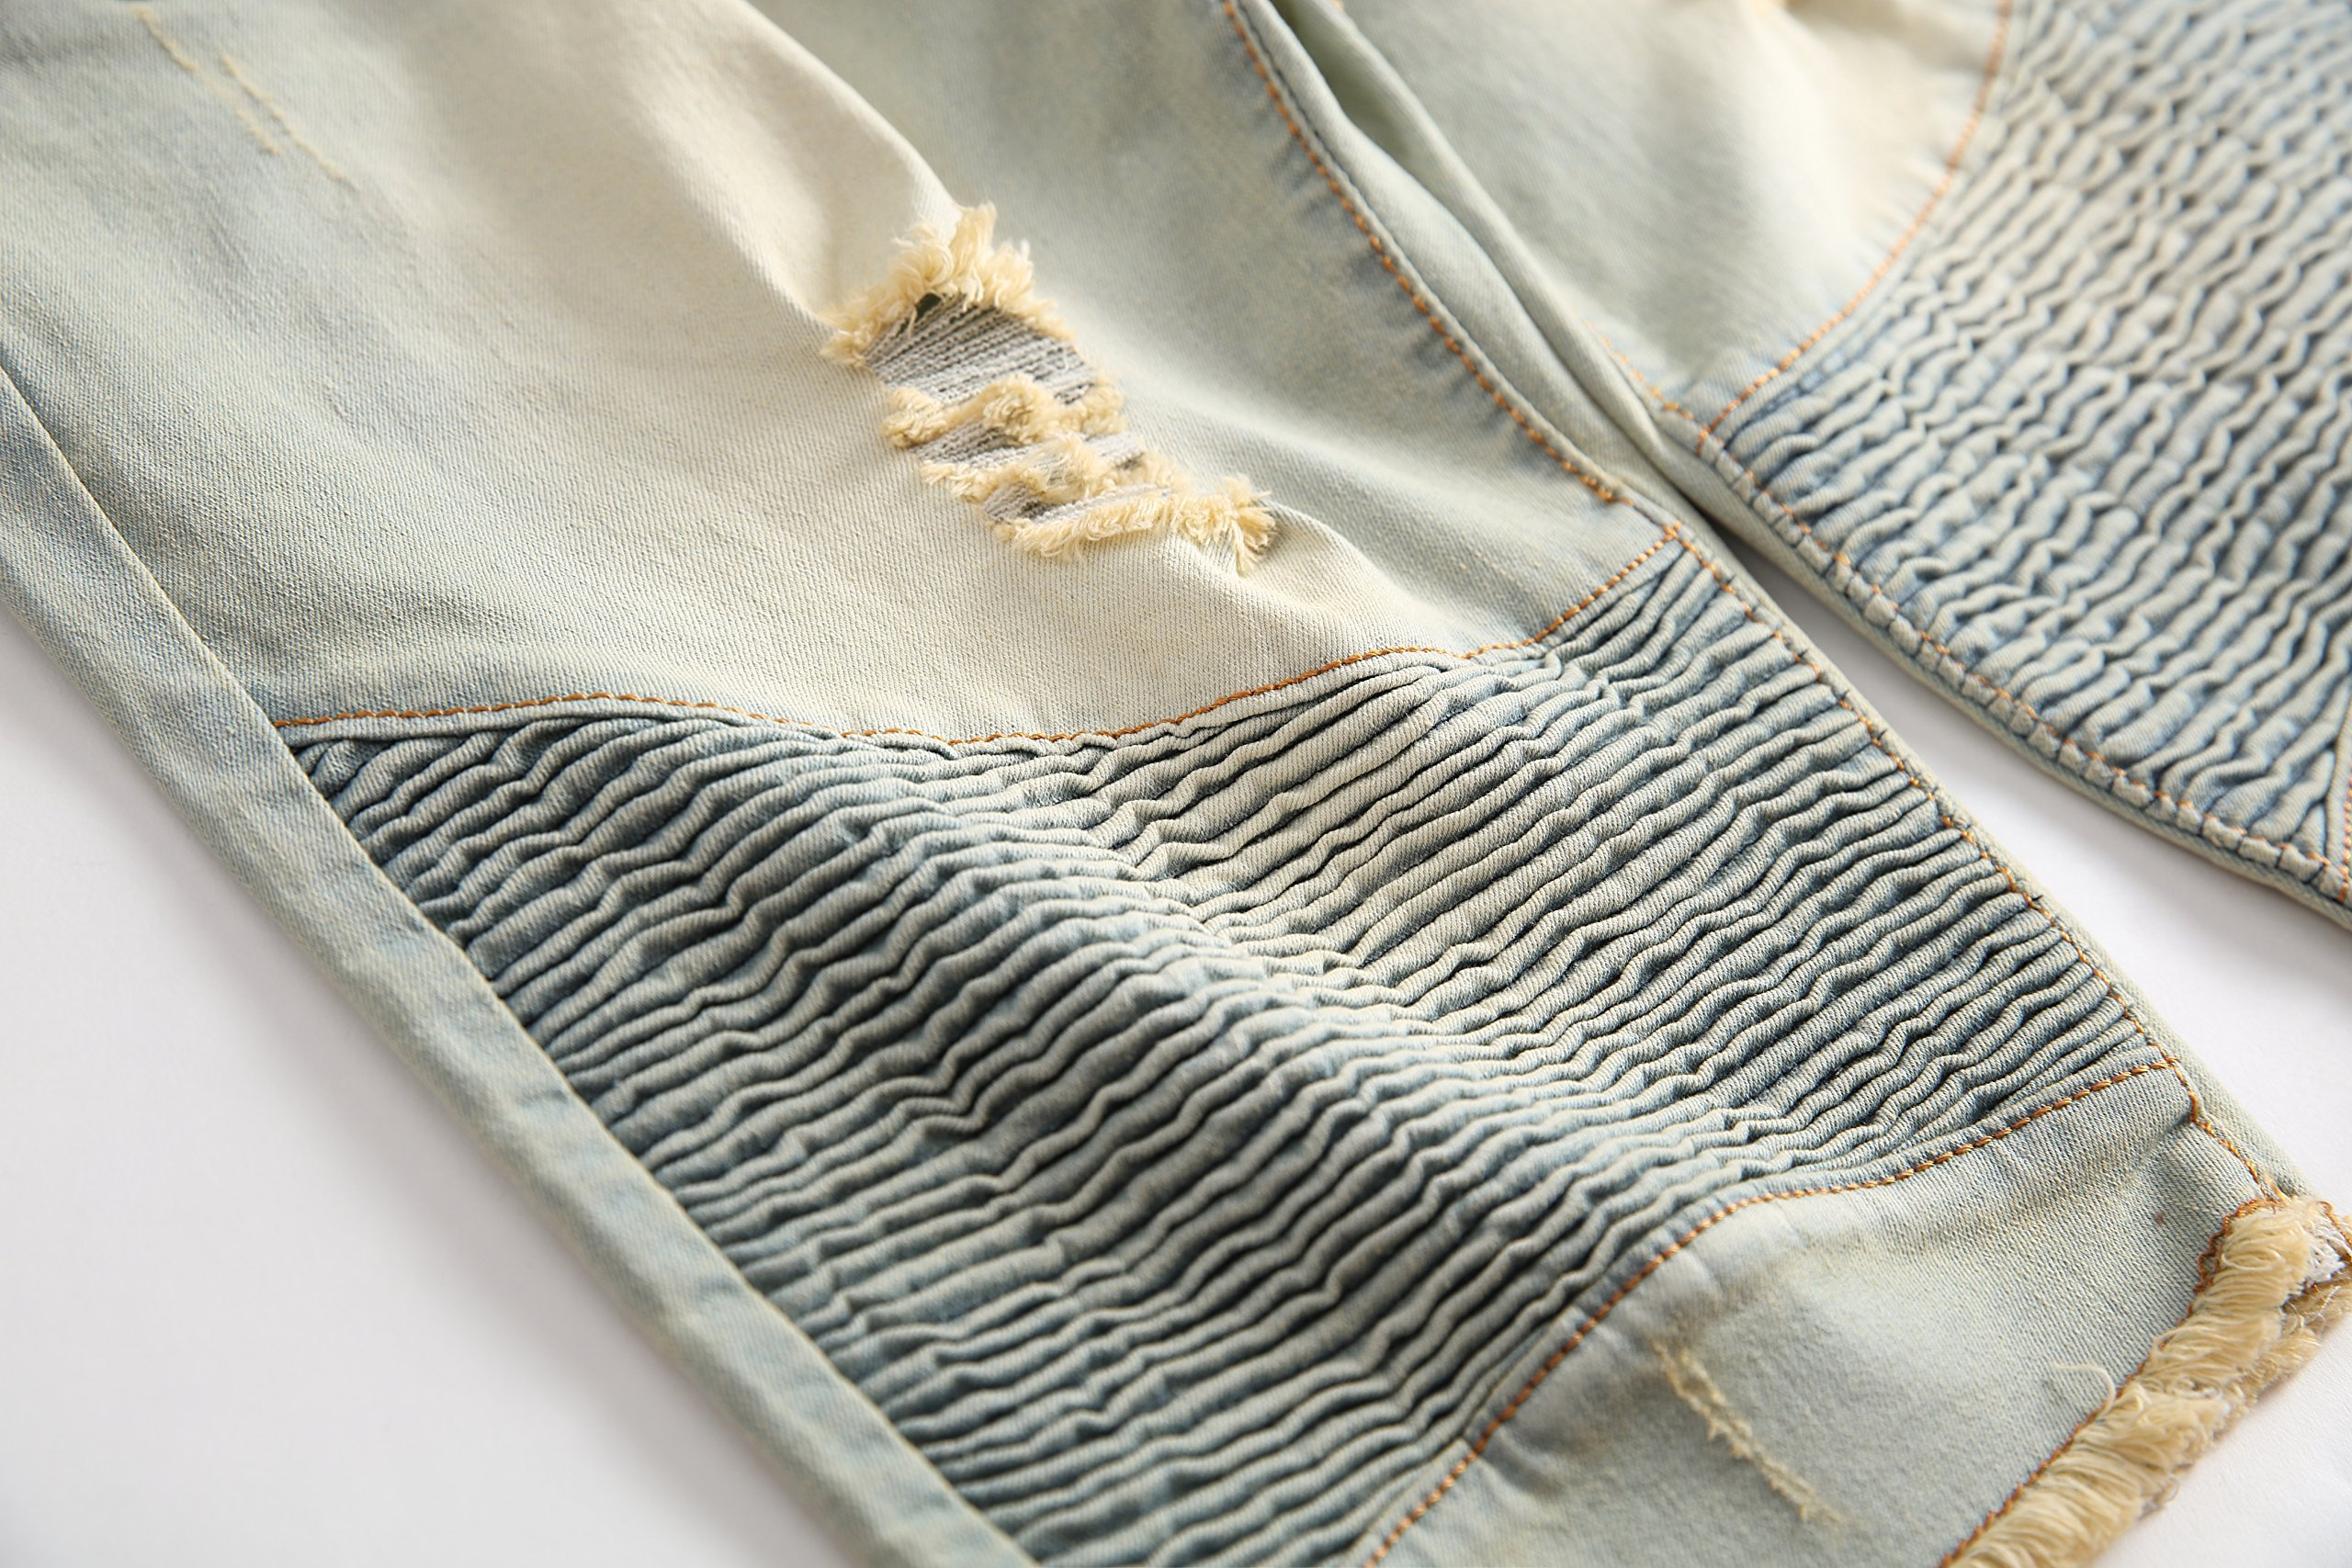 CLANNAD Men's Moto Biker Shorts Jeans Zipper Denim Casual Slim Shorts with Hole Vintage Blue 30 by CLANNAD (Image #5)